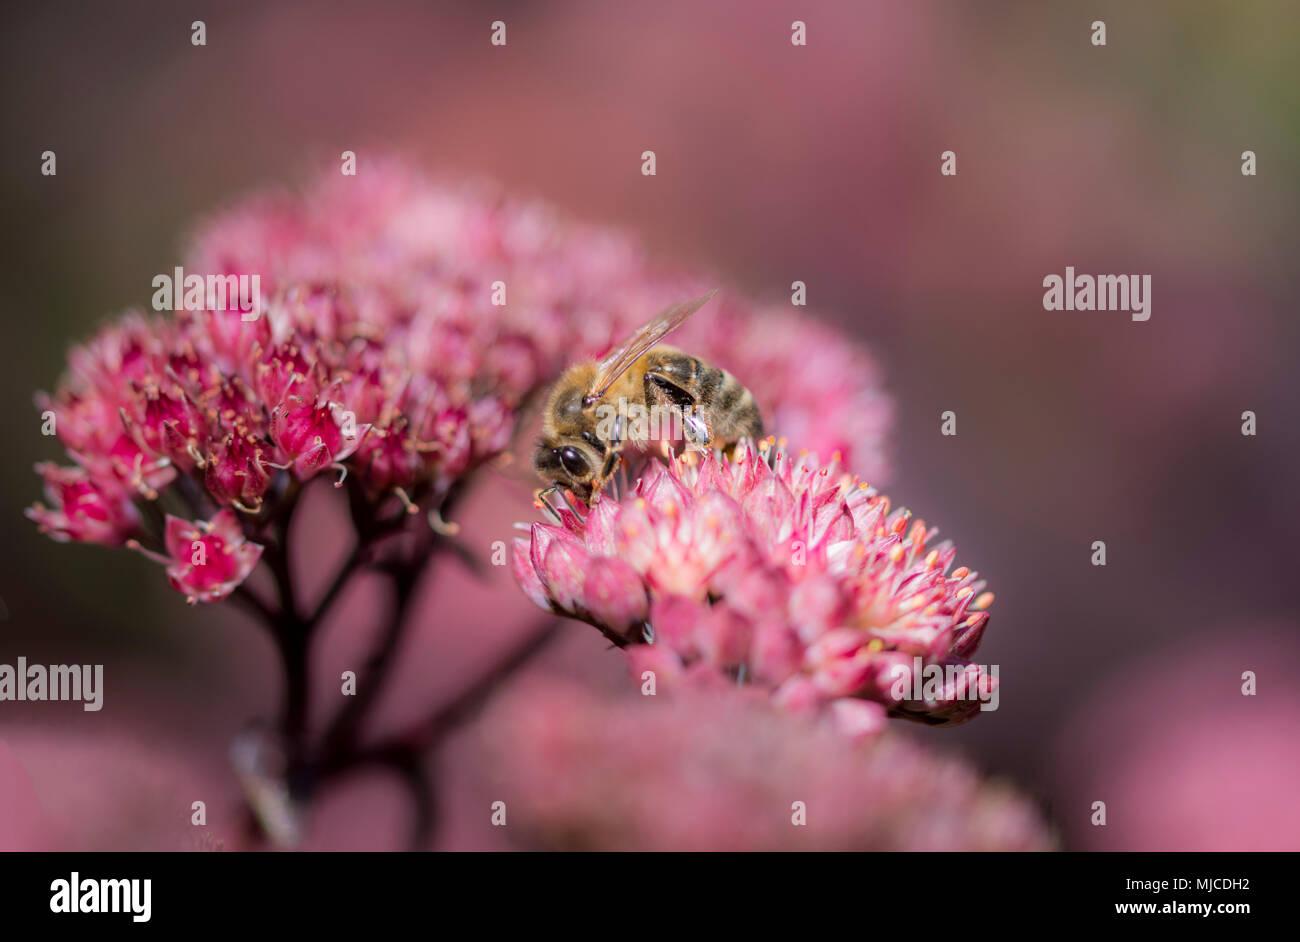 Honey bees collecting pollen on plants in my garden - Stock Image